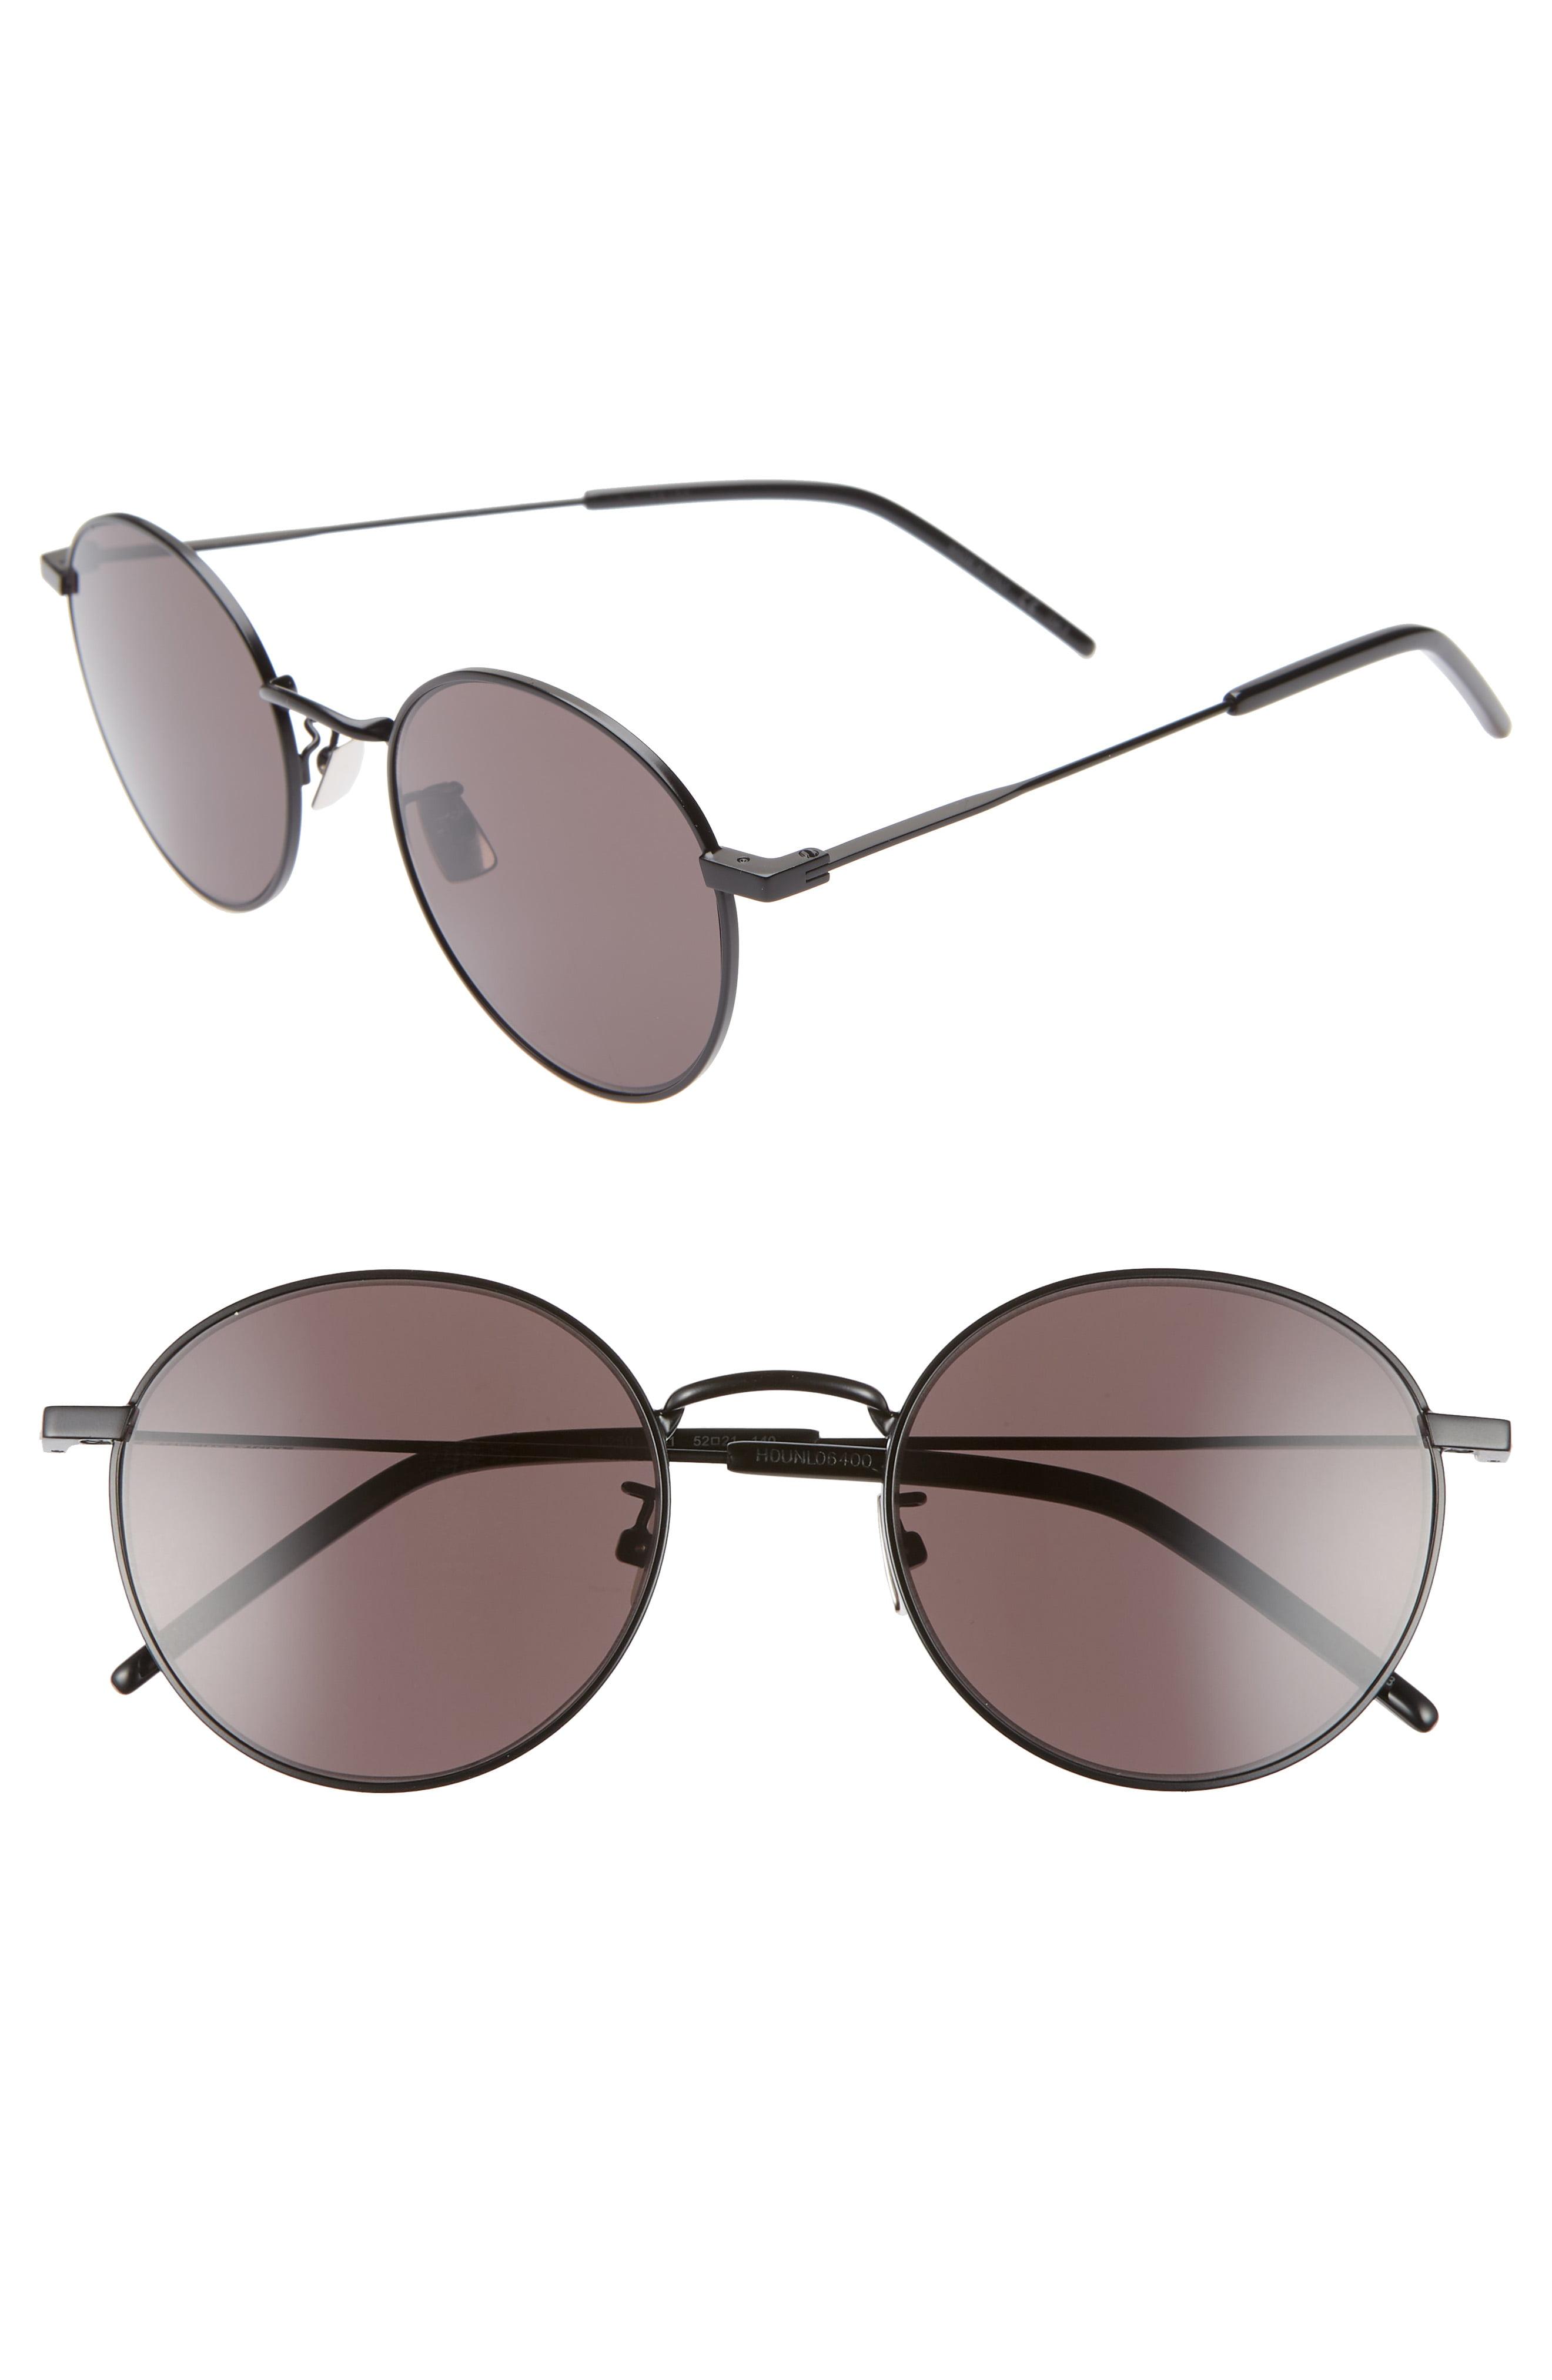 c67ea6a601 Men s Saint Laurent Sl 250 52Mm Sunglasses – Silver